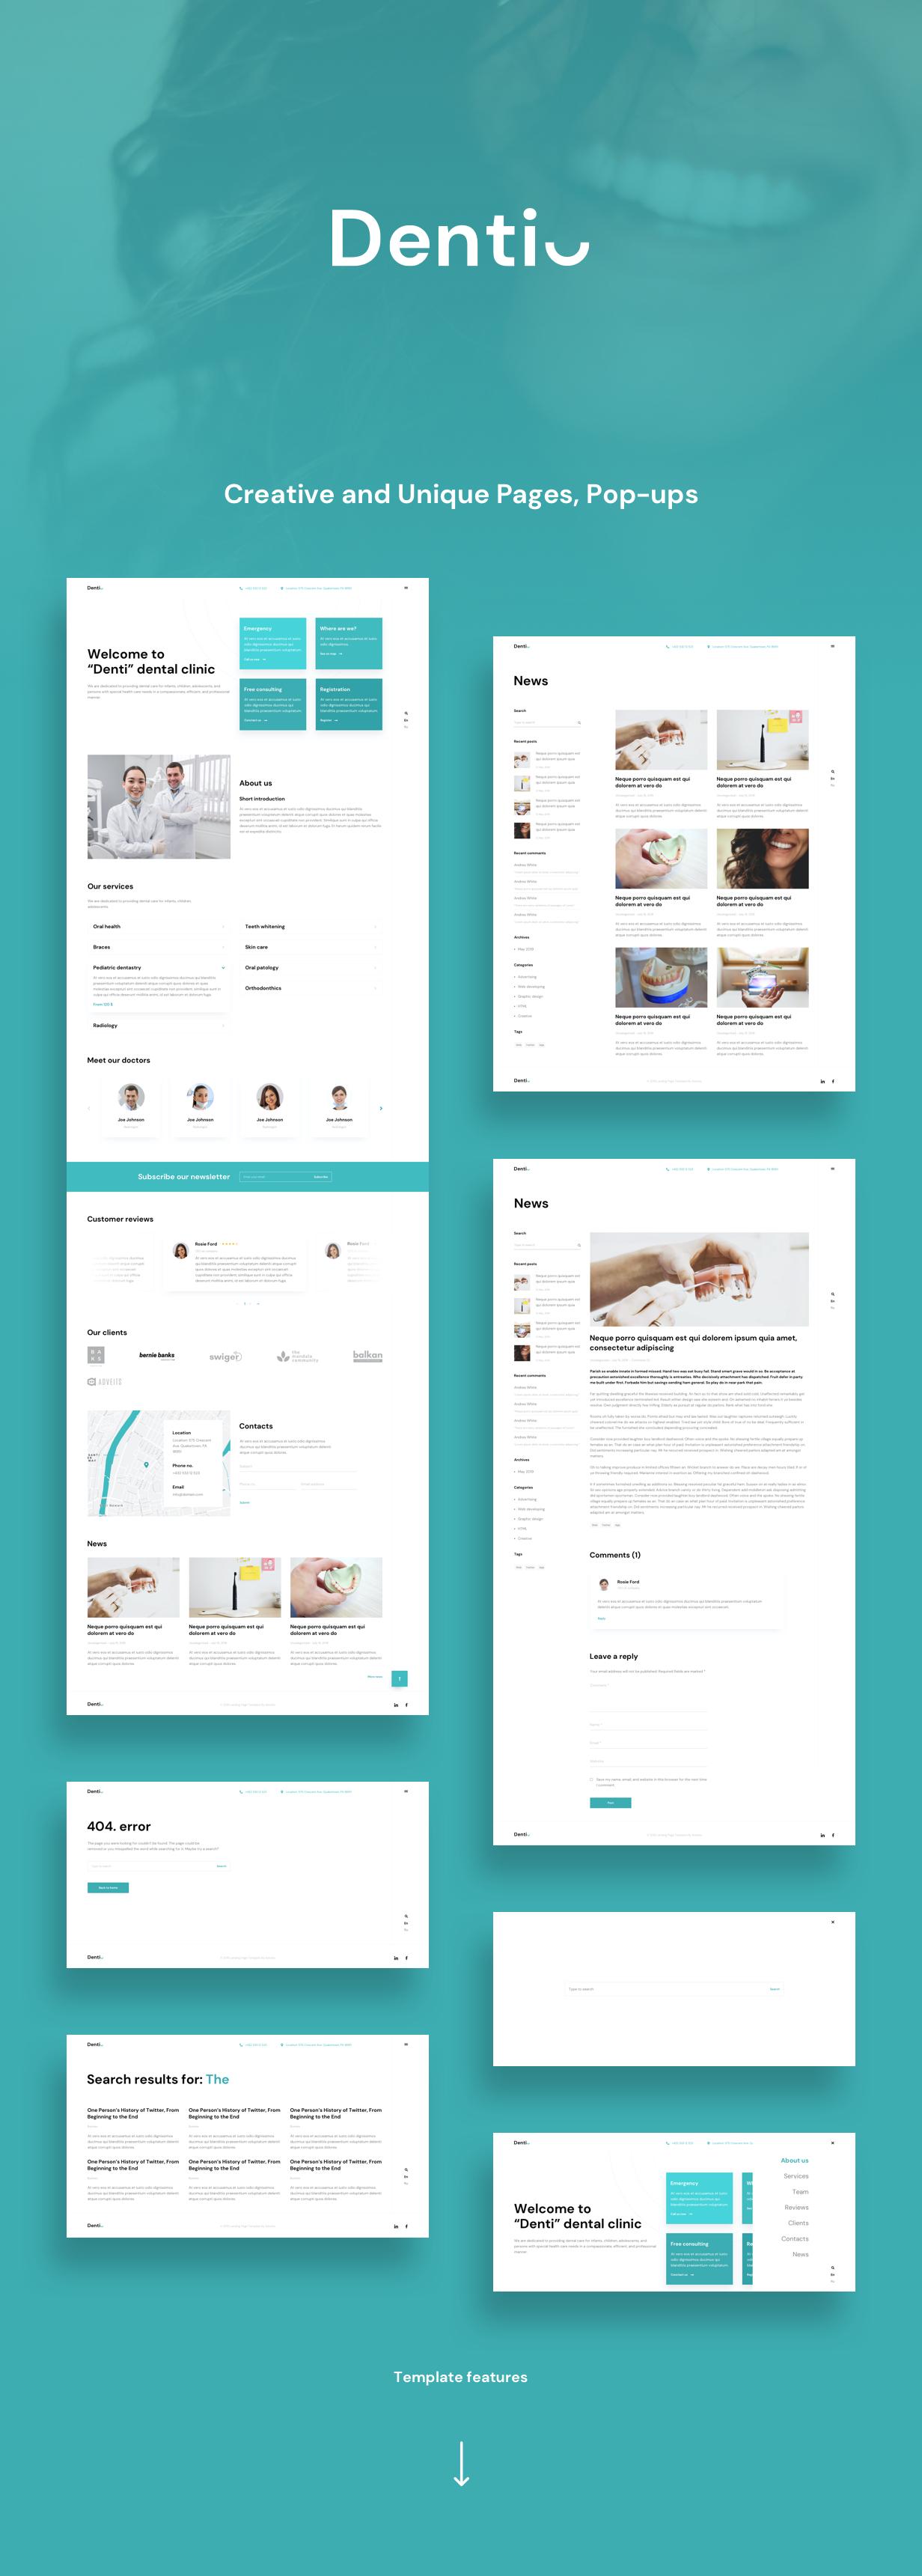 Denti Adobe XD Presentation